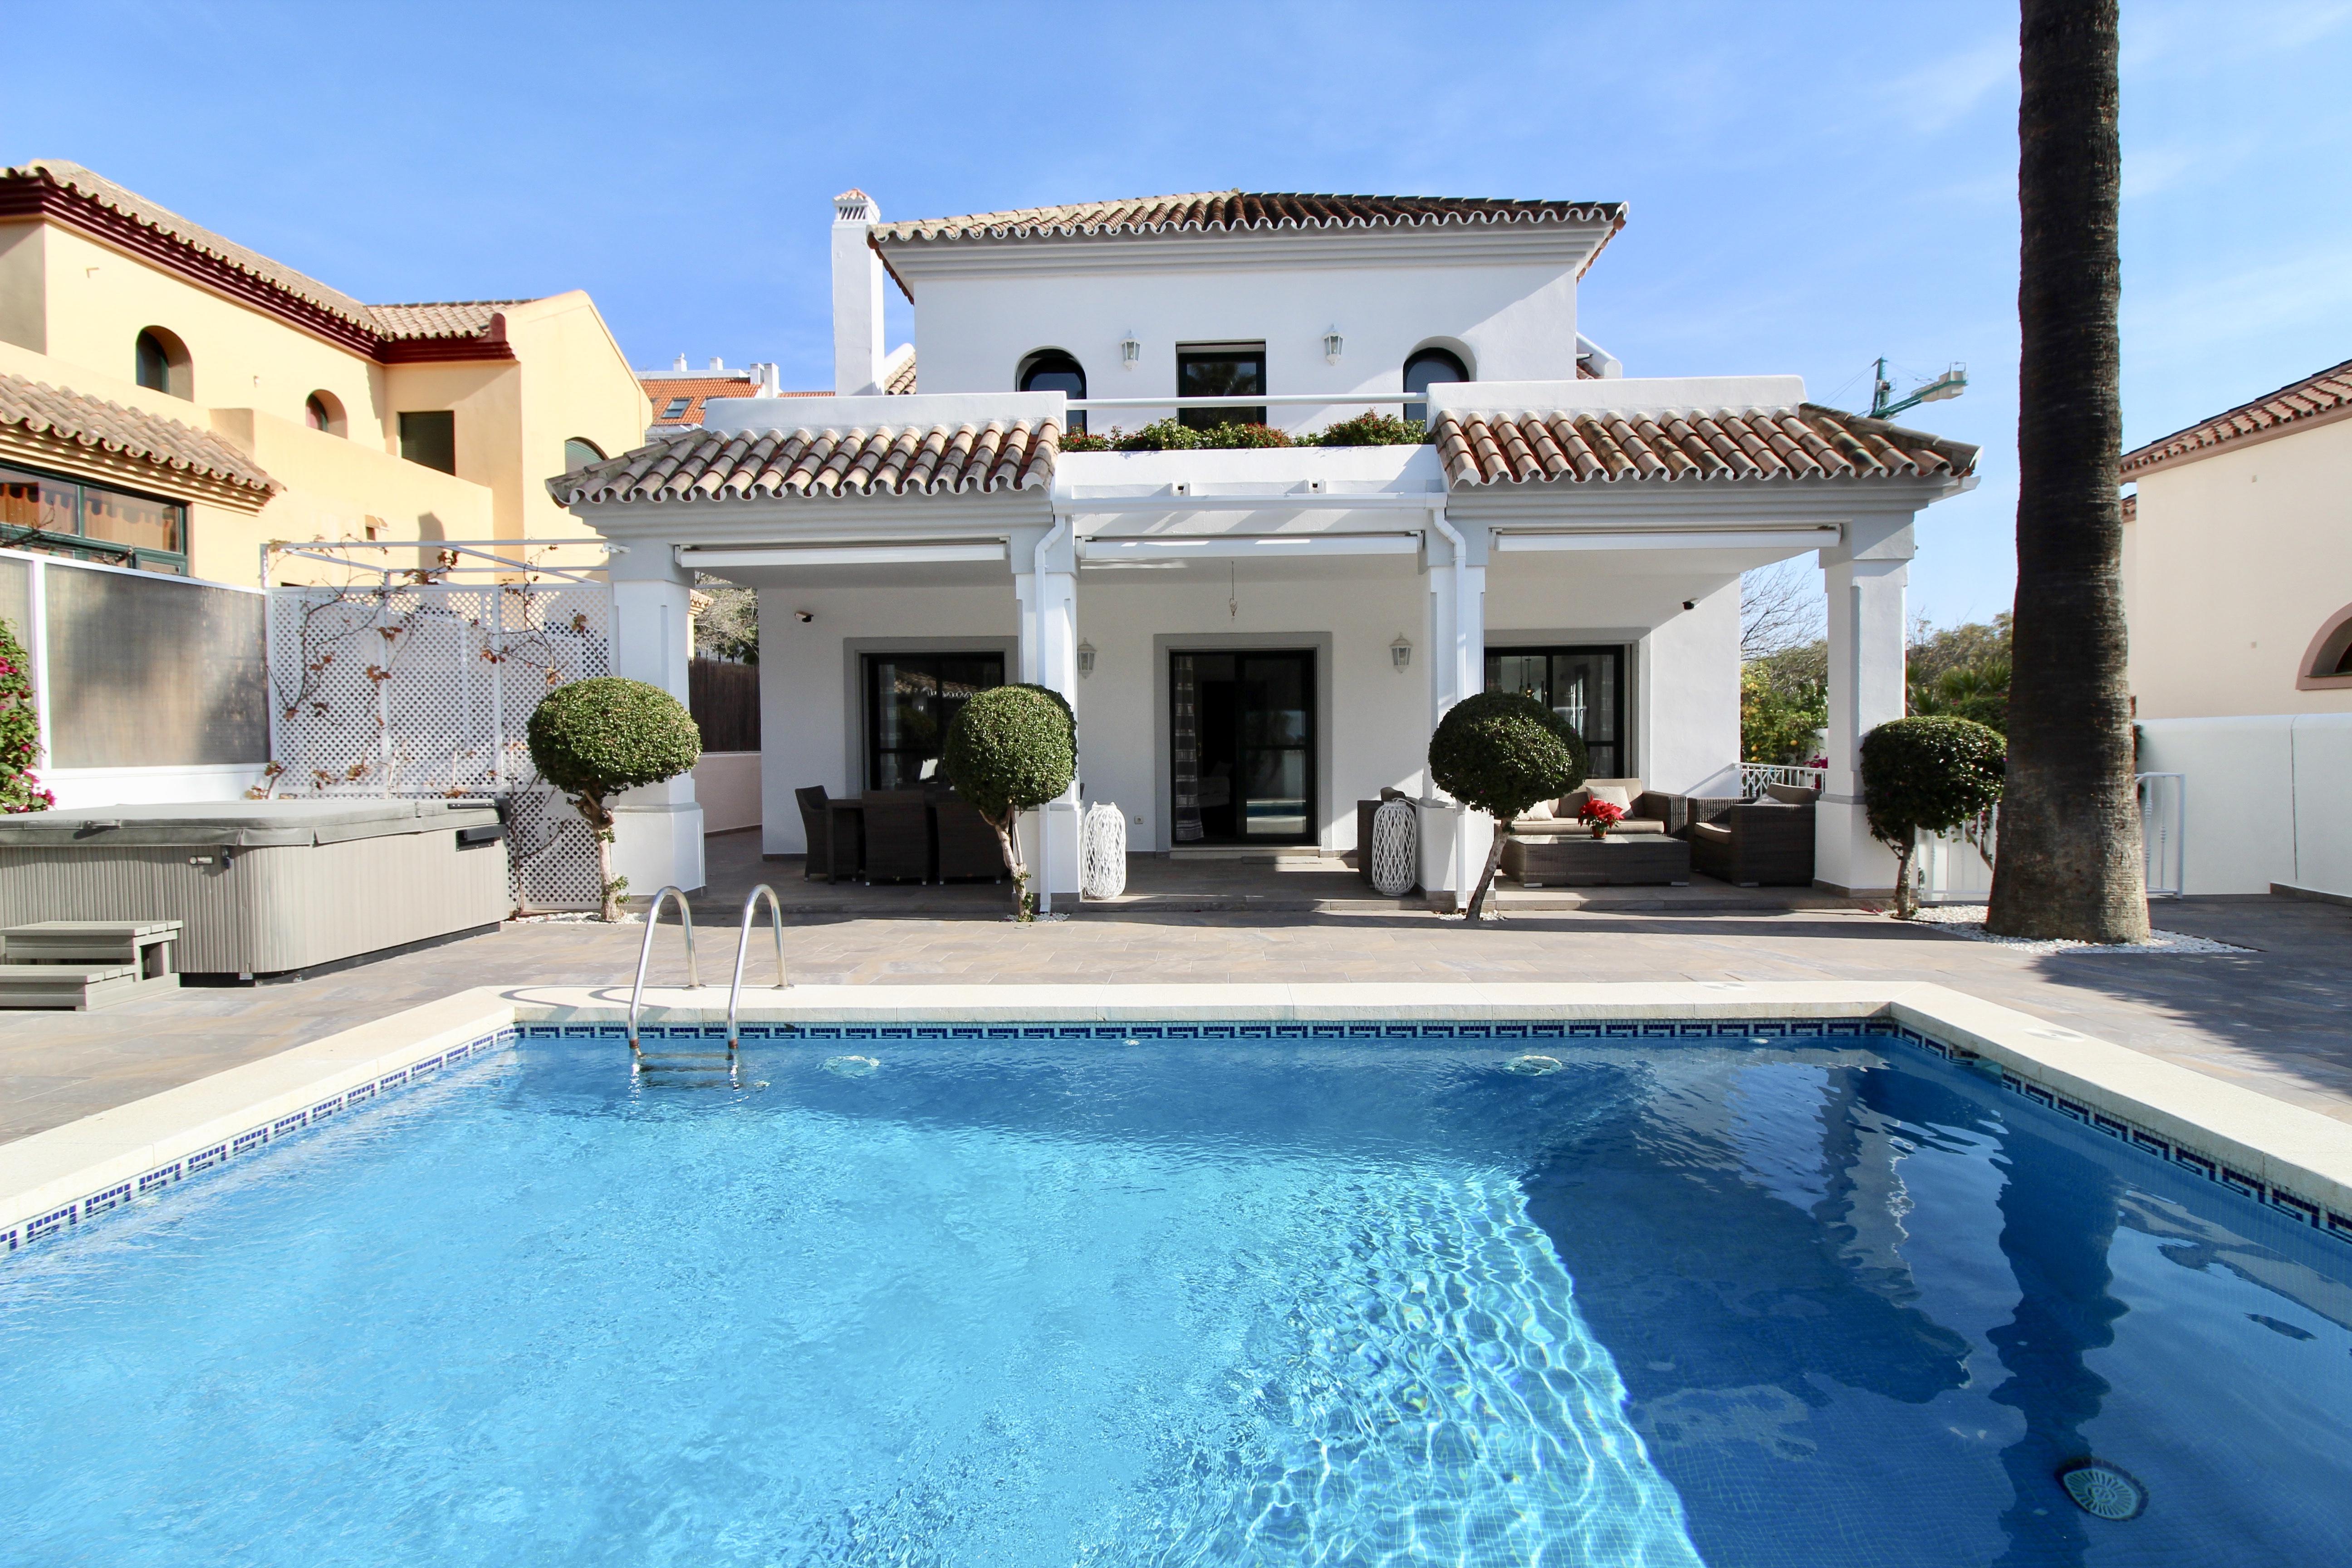 Ref:359-00096P Villa For Sale in San Pedro de Alcantara